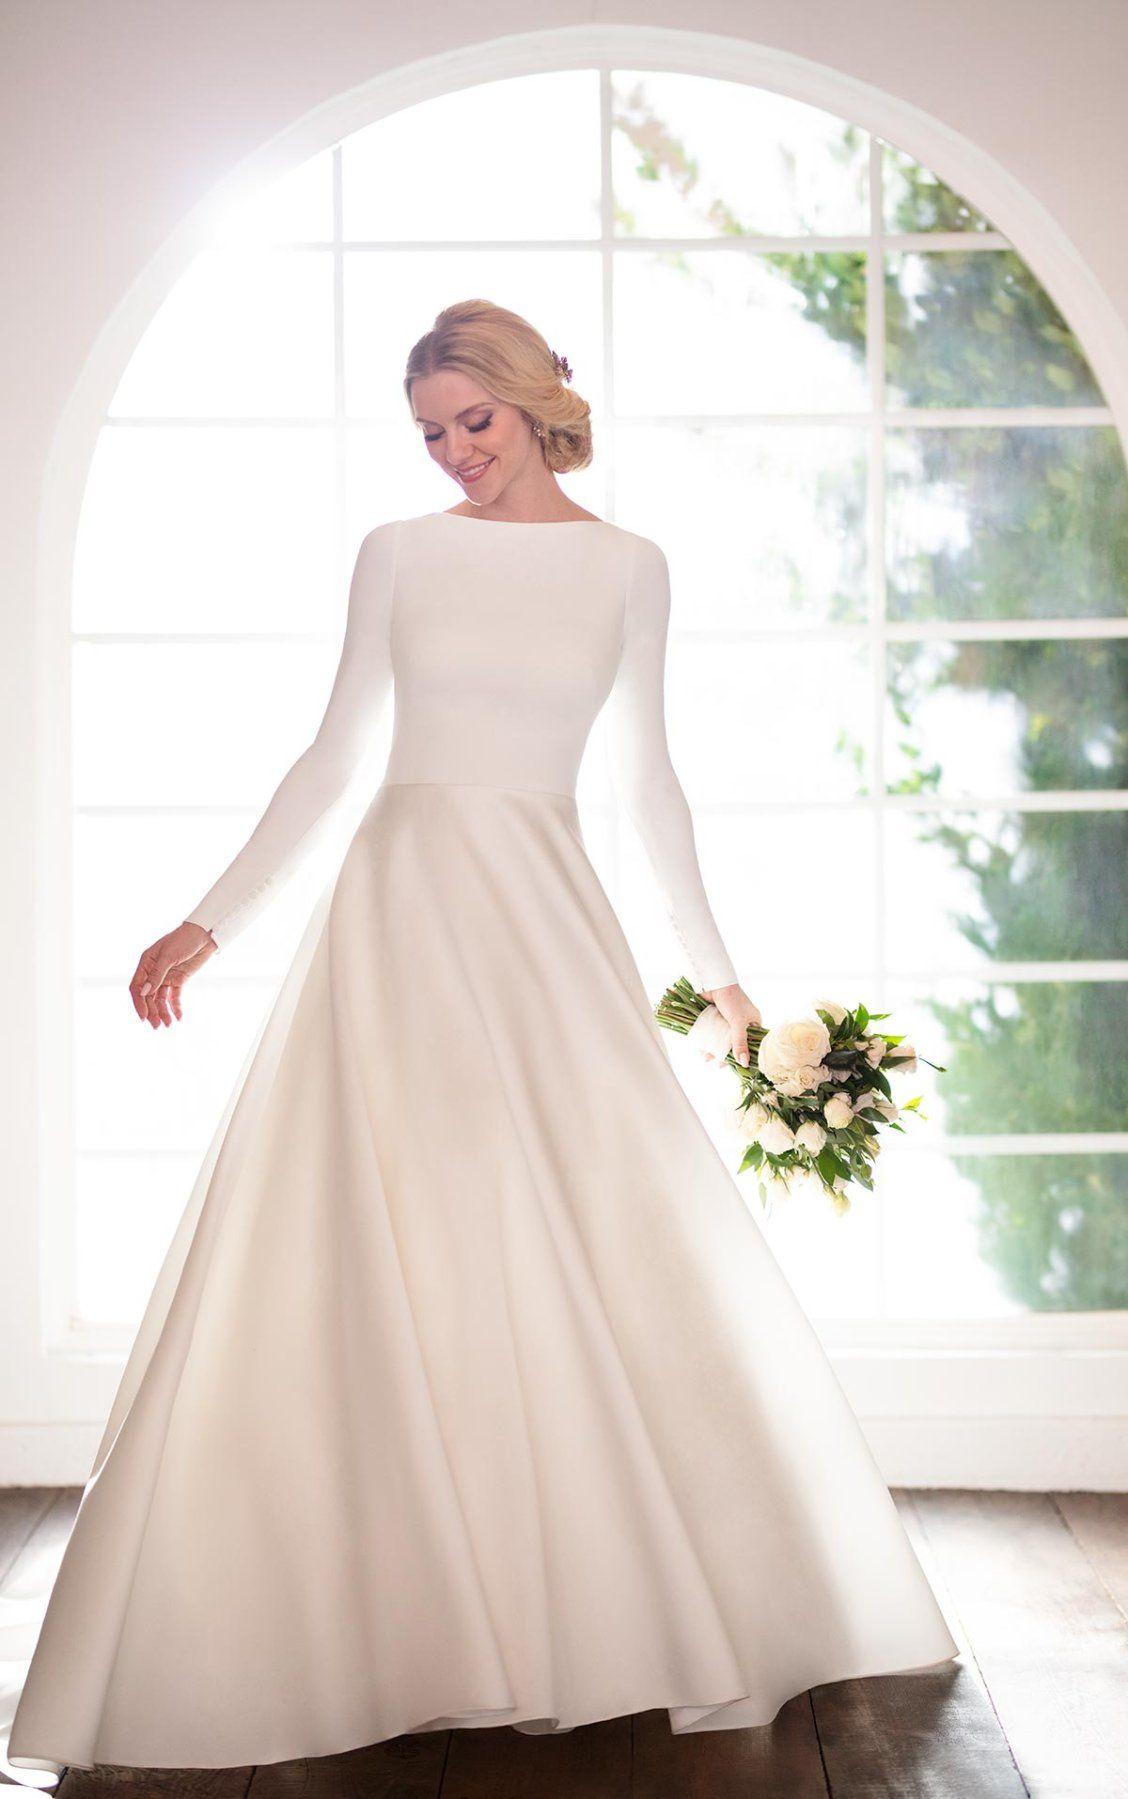 Modest Simple Ballgown With Sleeves Martina Liana Ball Gowns Wedding Fancy Wedding Dresses Wedding Dress Long Sleeve [ 1799 x 1128 Pixel ]